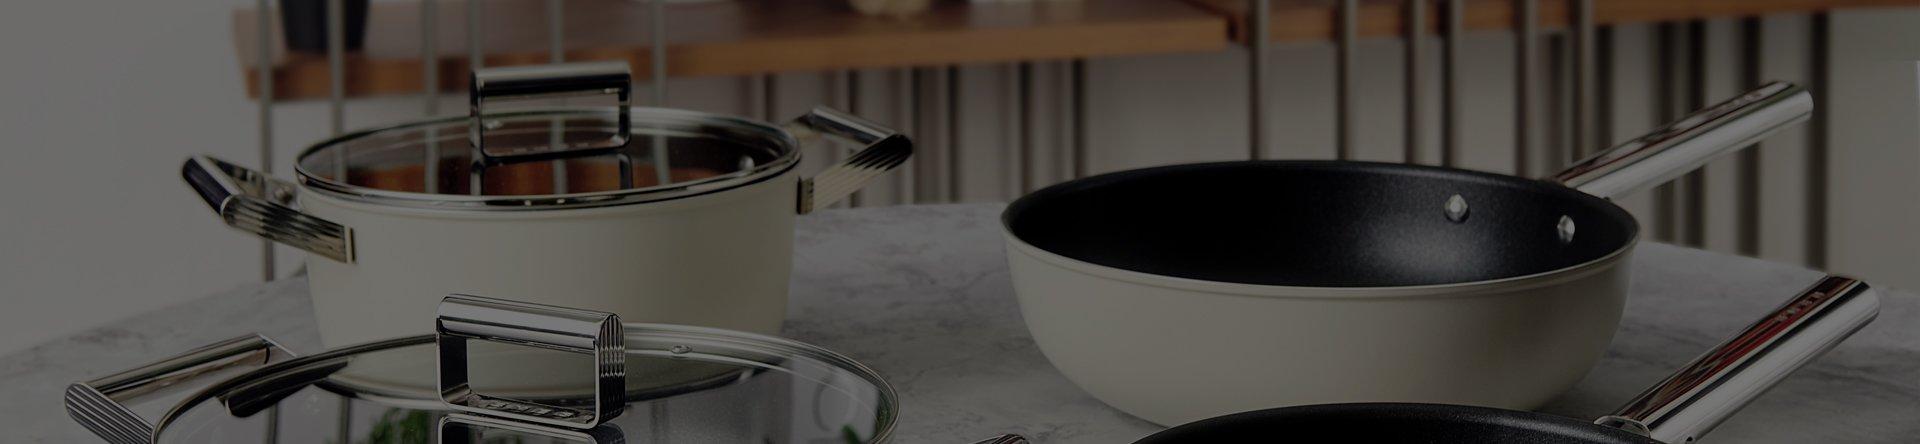 Menaje de cocina Smeg | Tienda online oficial | Shop Smeg